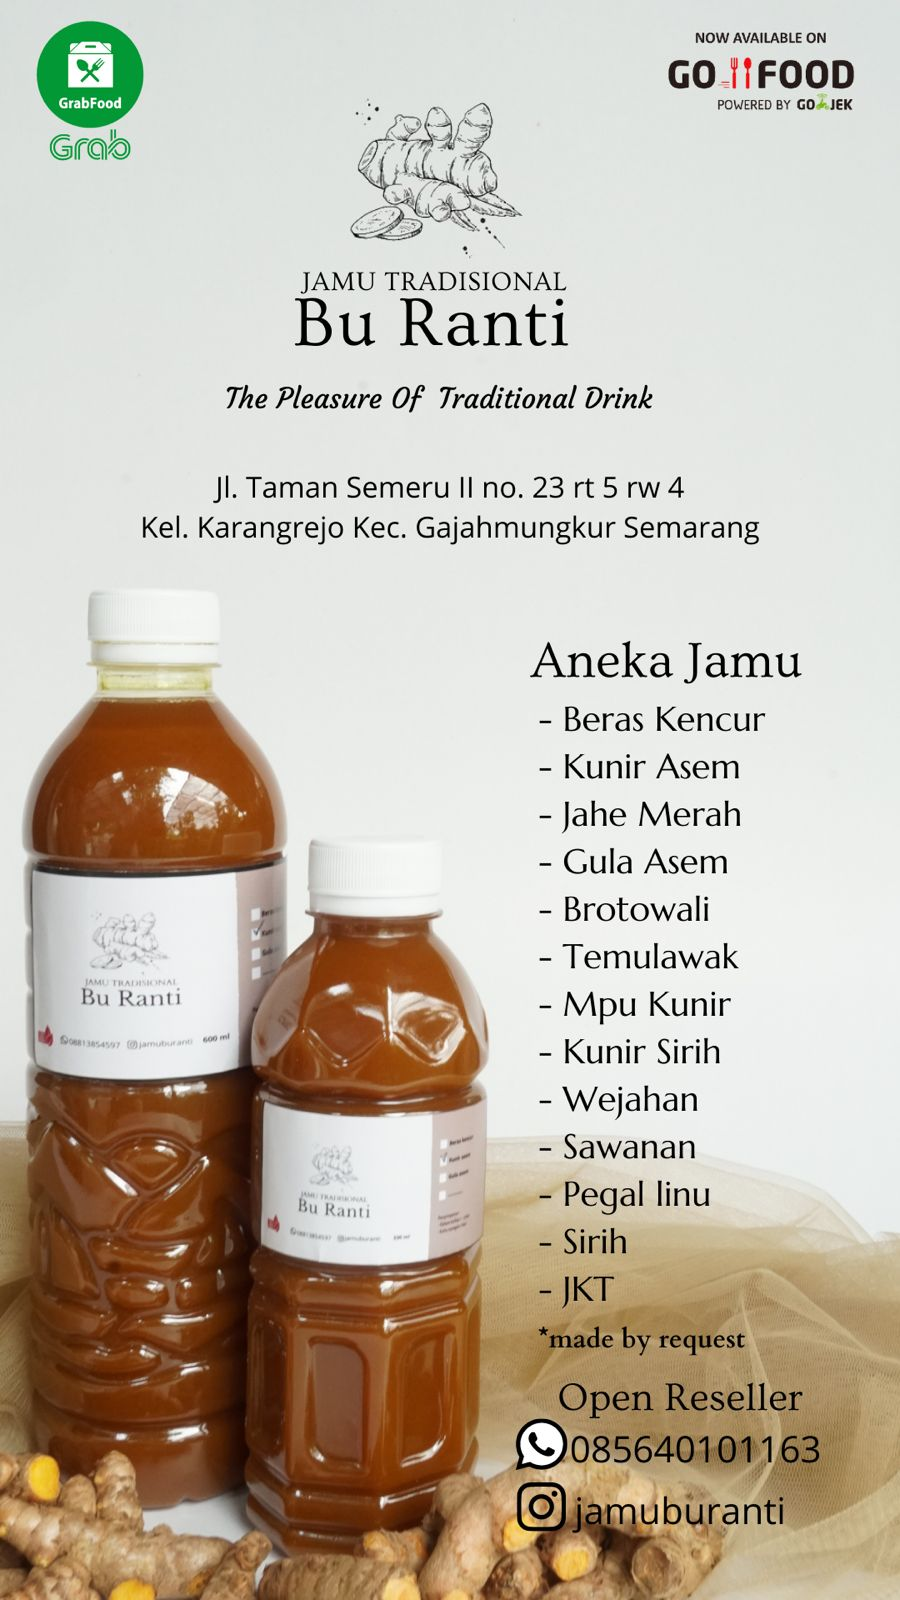 Jamu Made by Request 1 liter